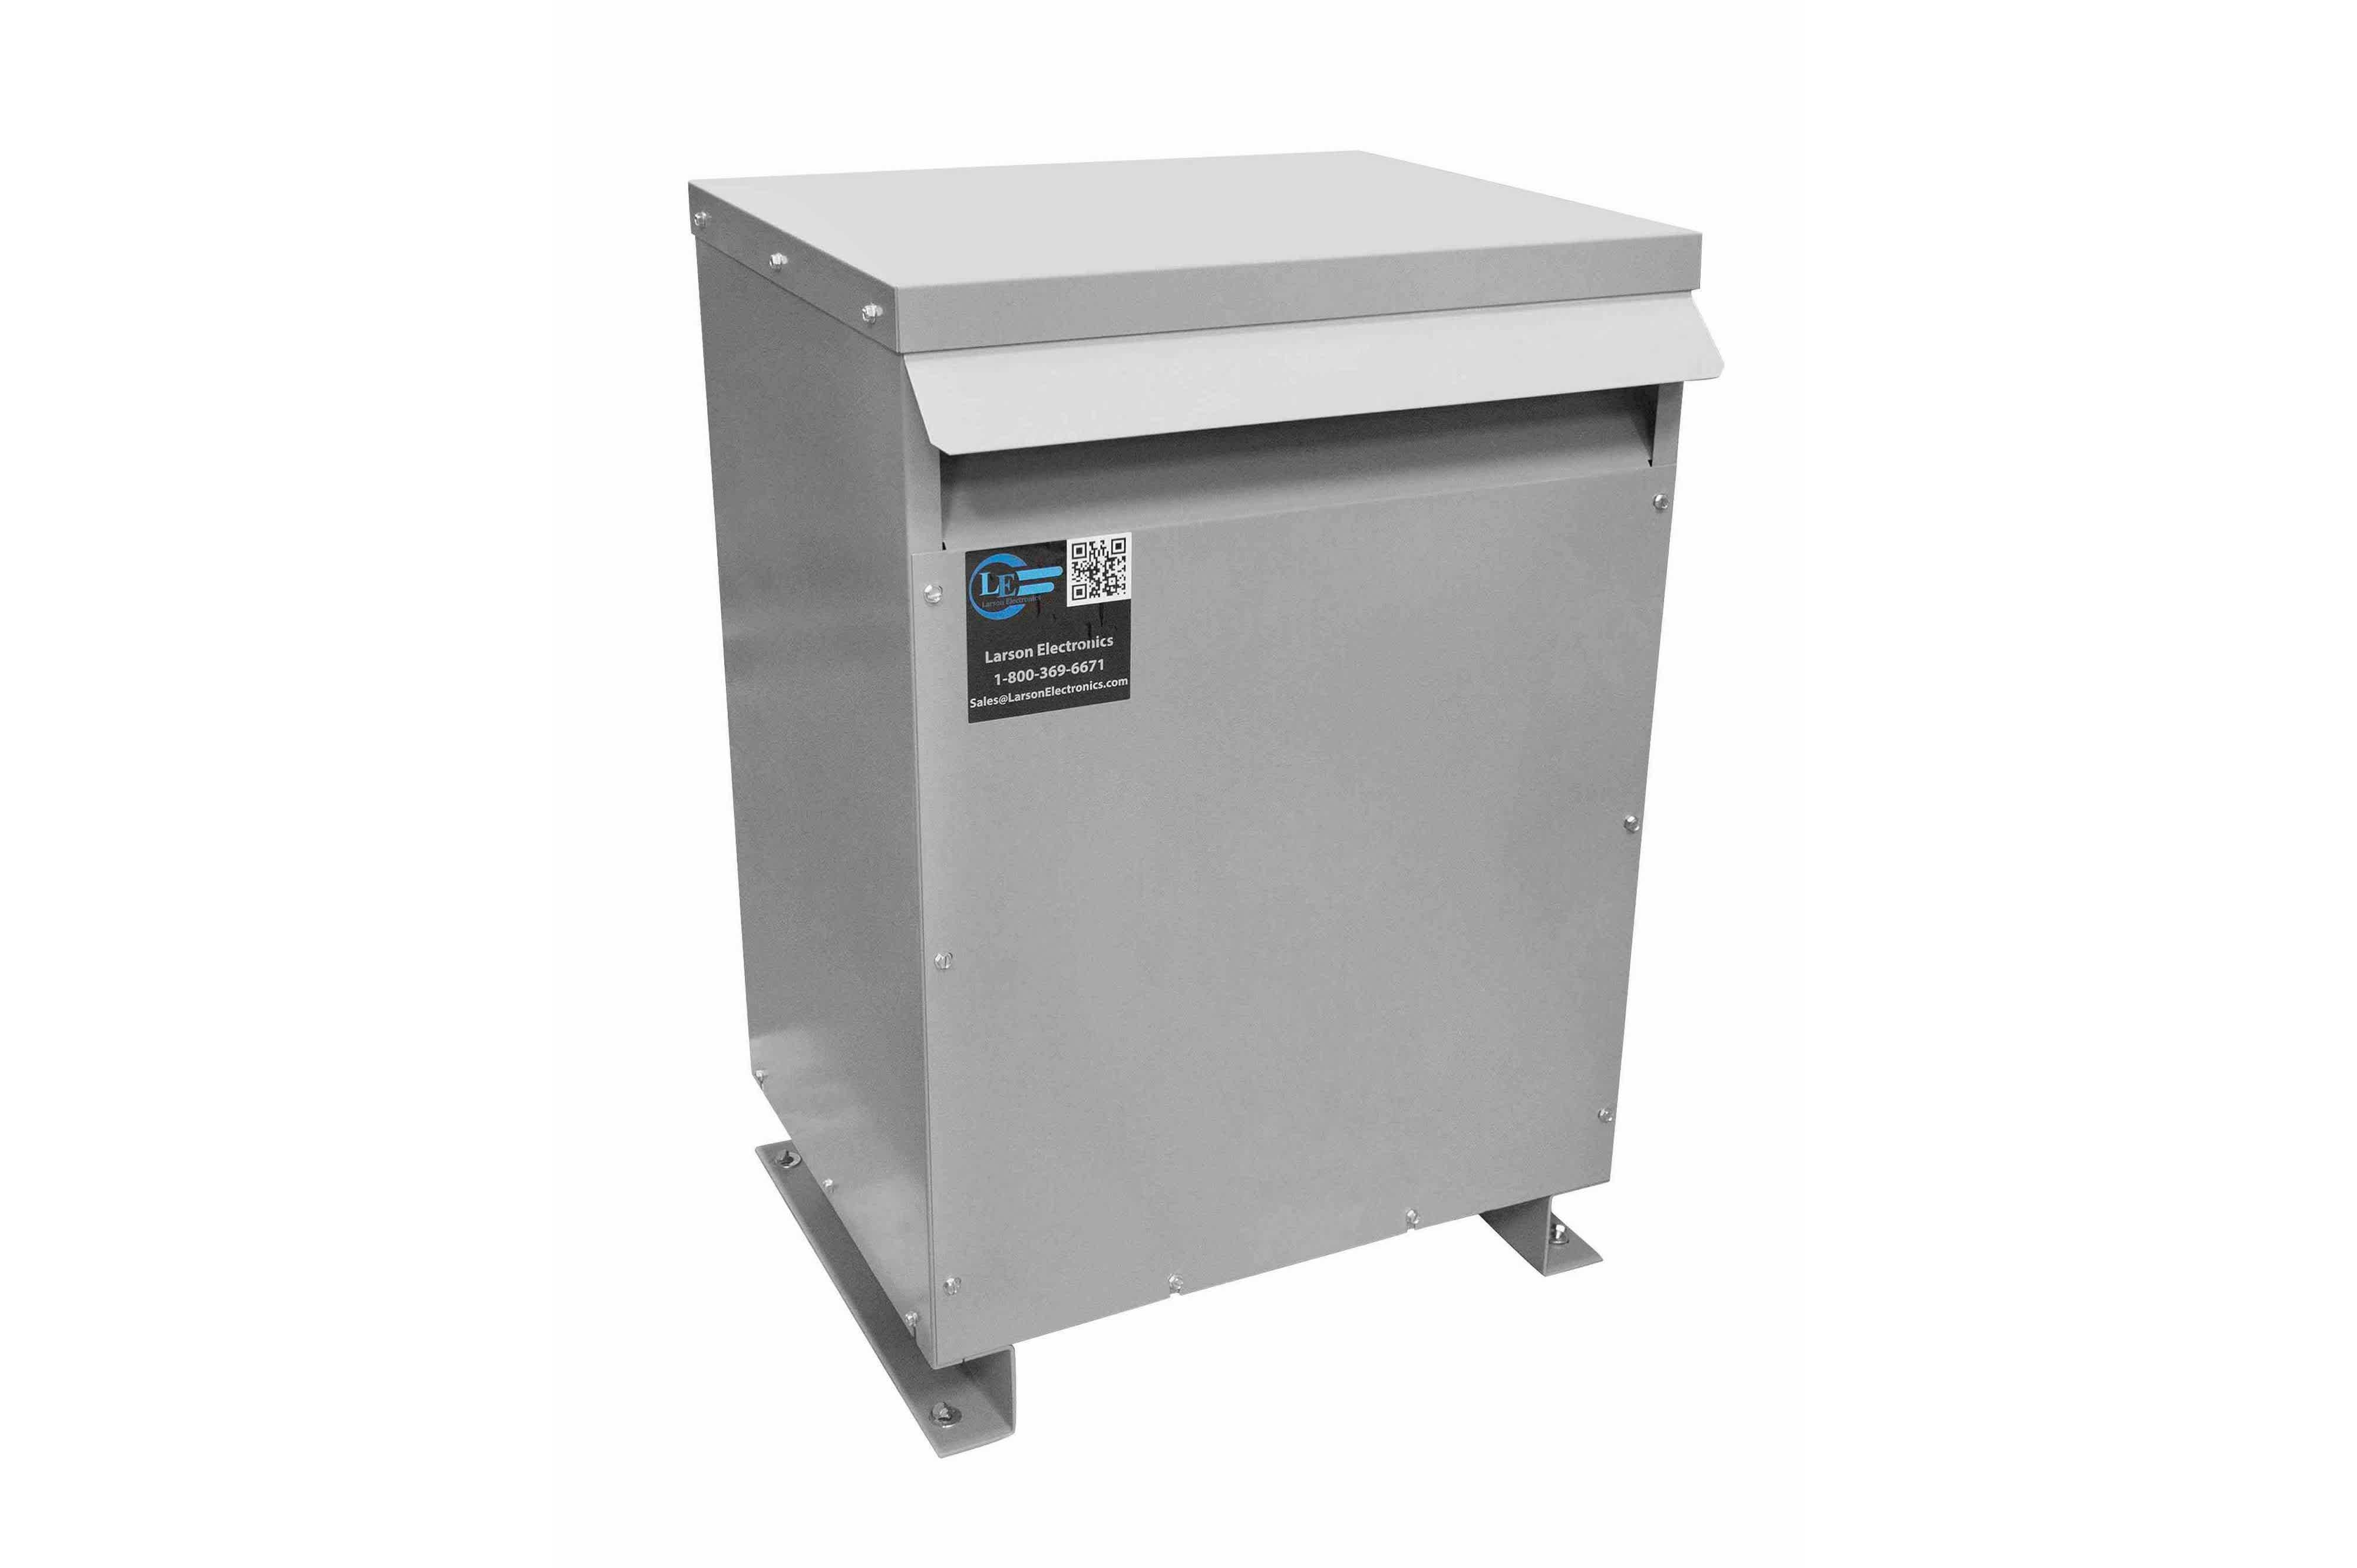 38 kVA 3PH Isolation Transformer, 380V Wye Primary, 240V/120 Delta Secondary, N3R, Ventilated, 60 Hz